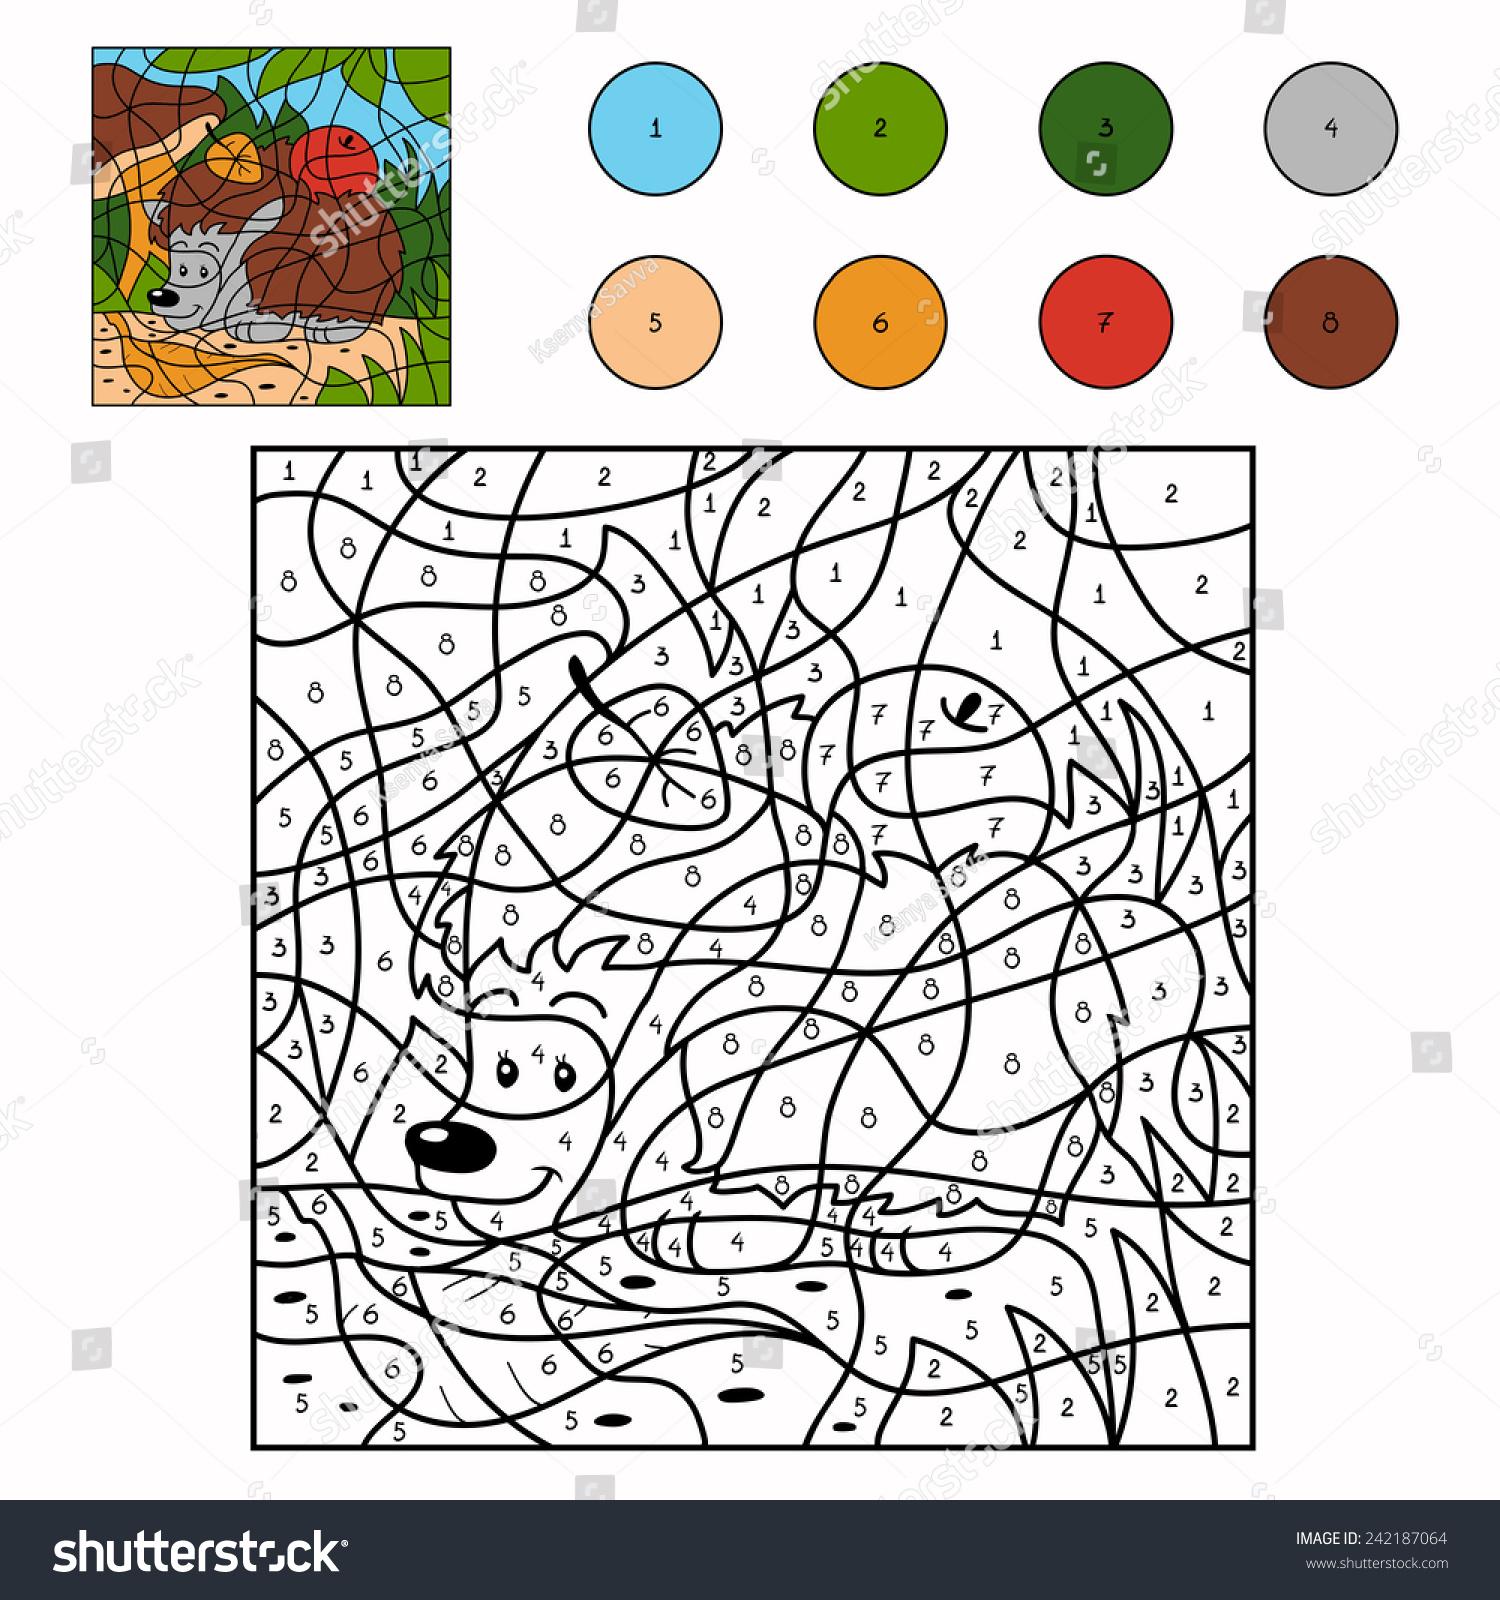 Kumpulan Gambar Mewarnai Tingkat Lanjut Kelas Edukasi